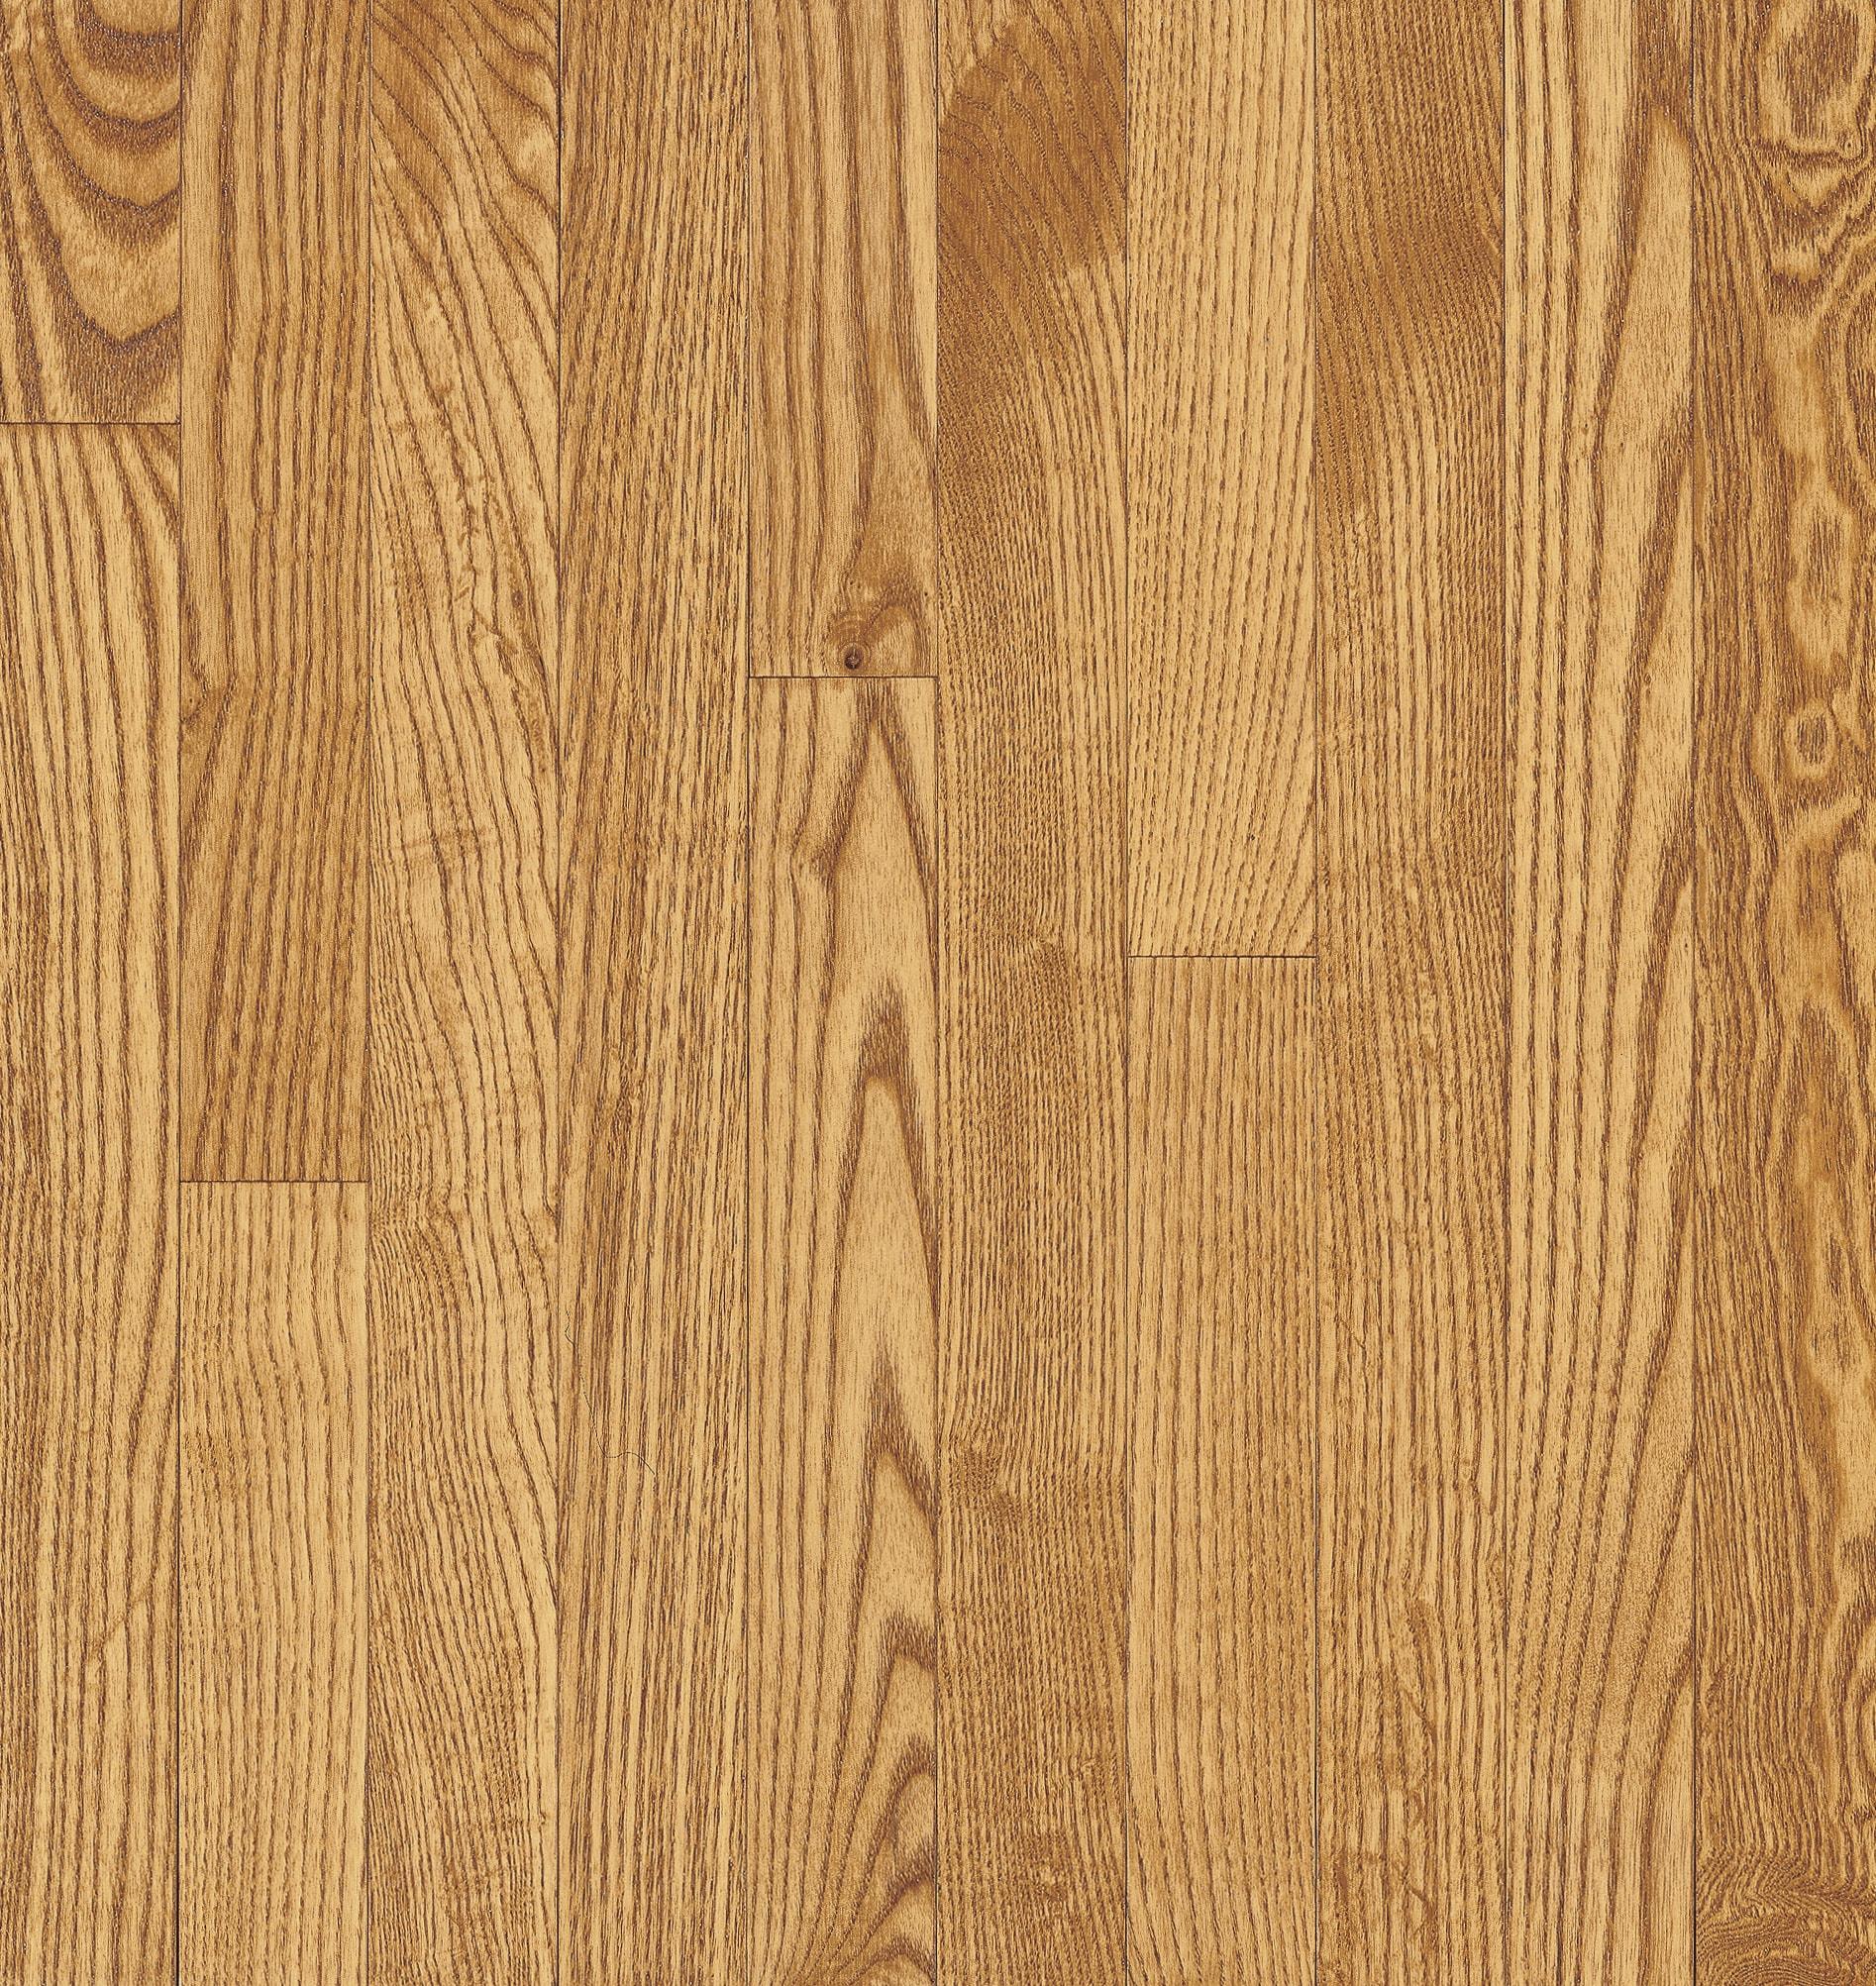 Seashell hardwood floor